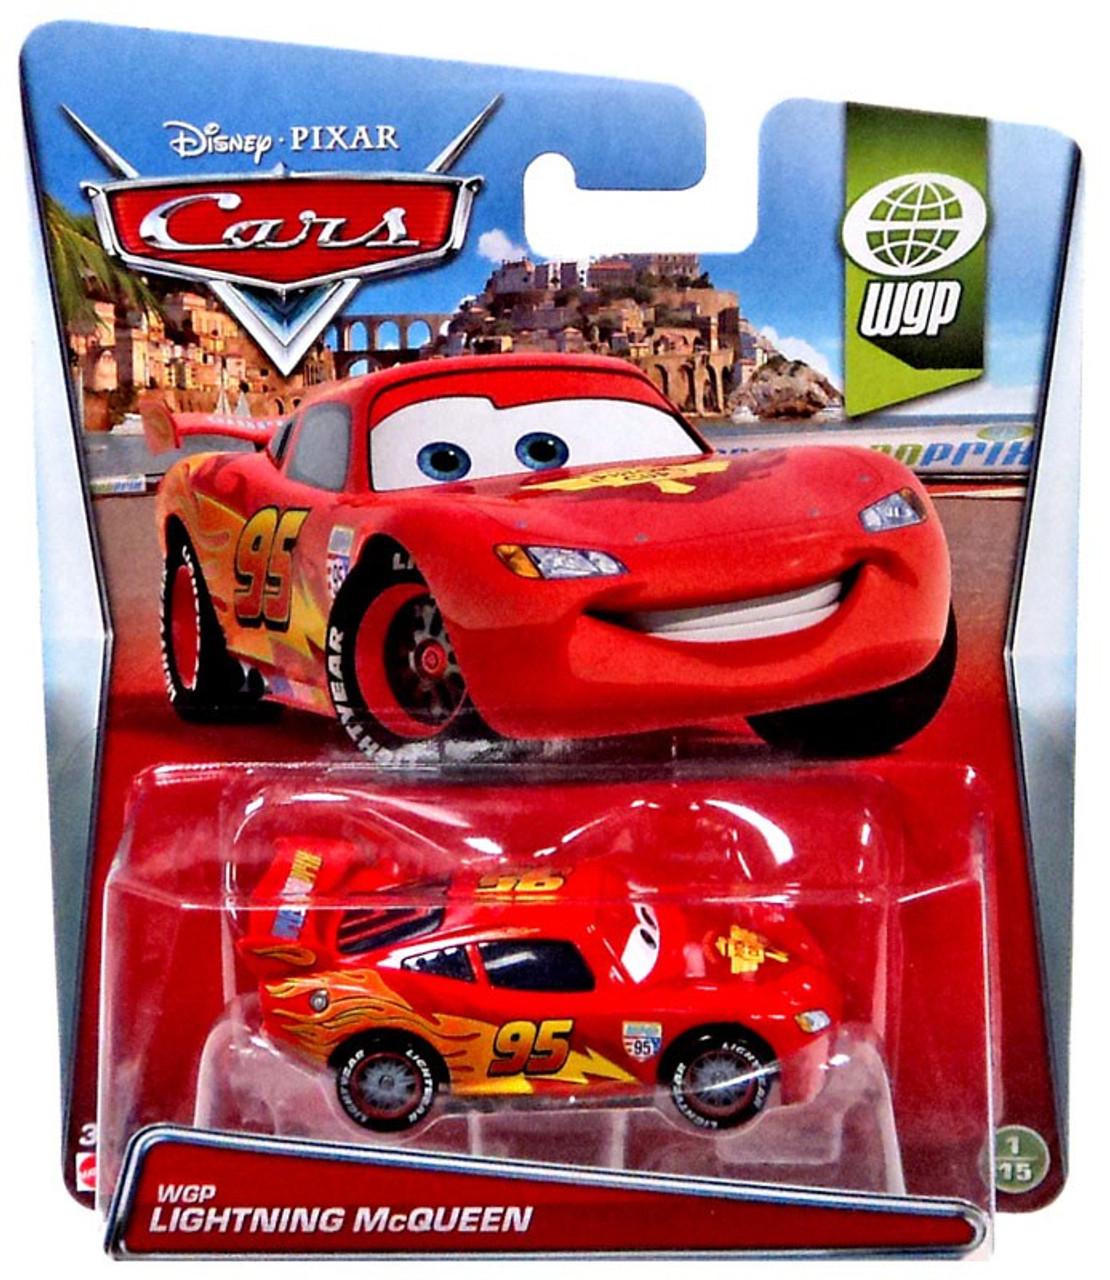 Disney Pixar Cars WGP Lightning McQueen 155 Diecast Car